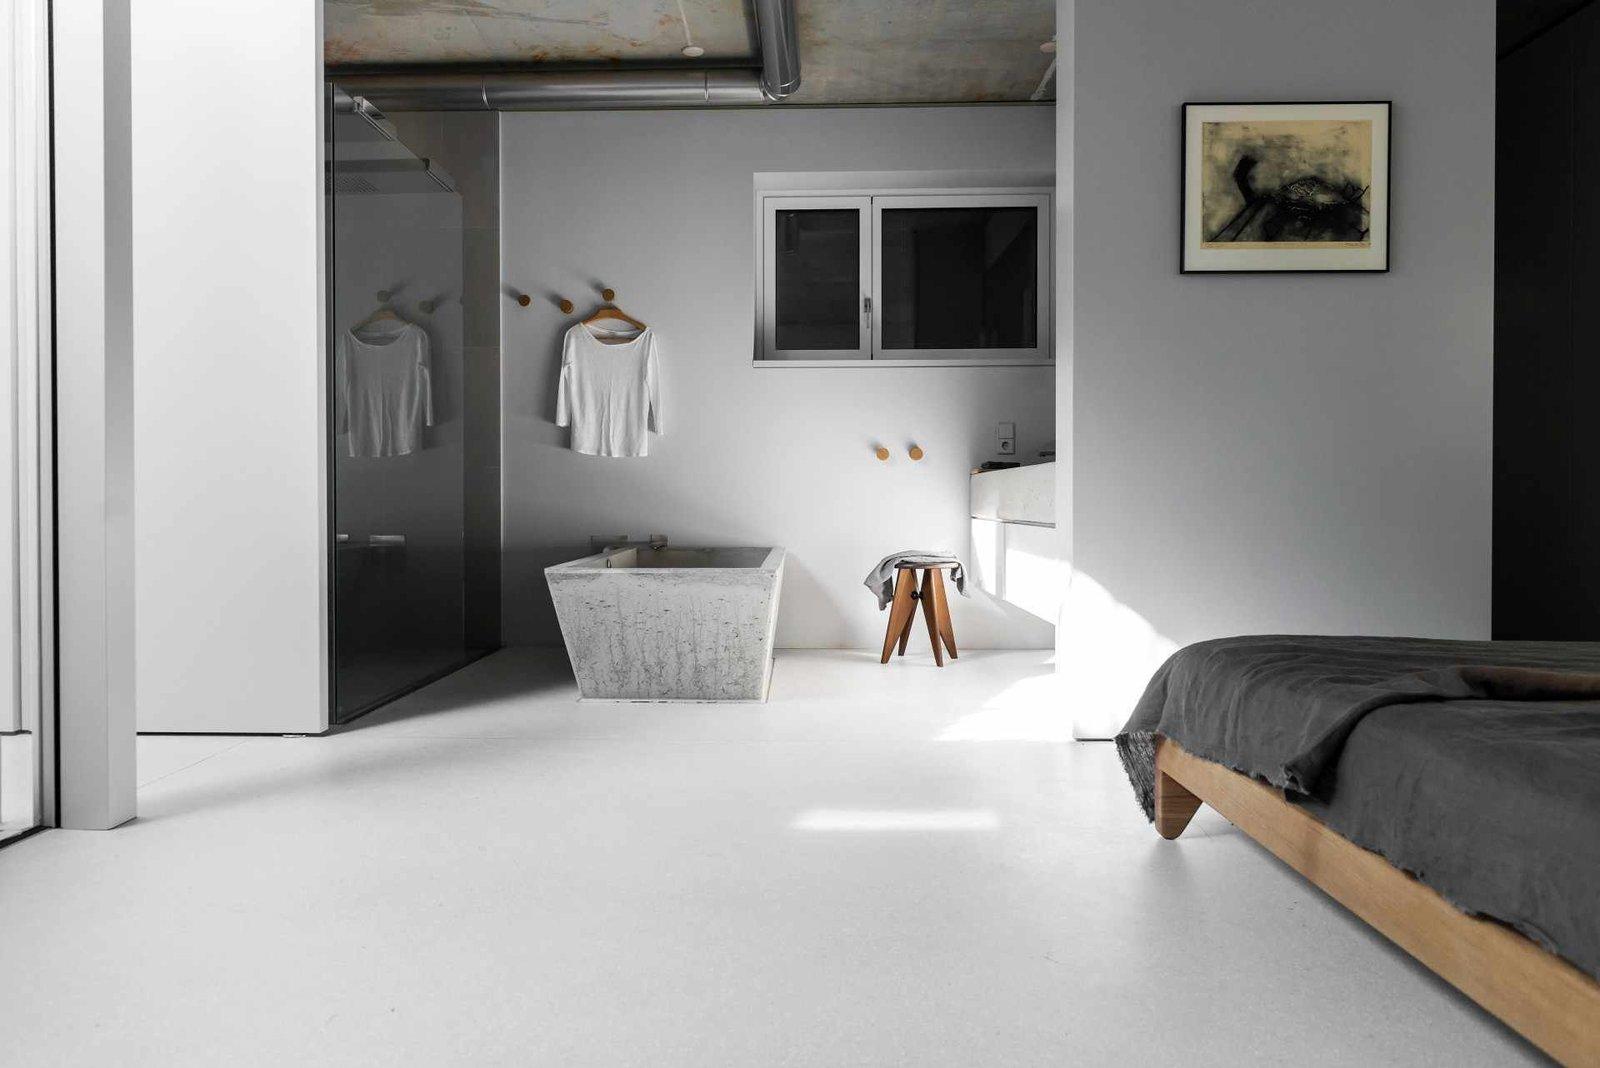 Bath Room, Freestanding Tub, Soaking Tub, Enclosed Shower, and Corner Shower  House on Prenzlauer Berg